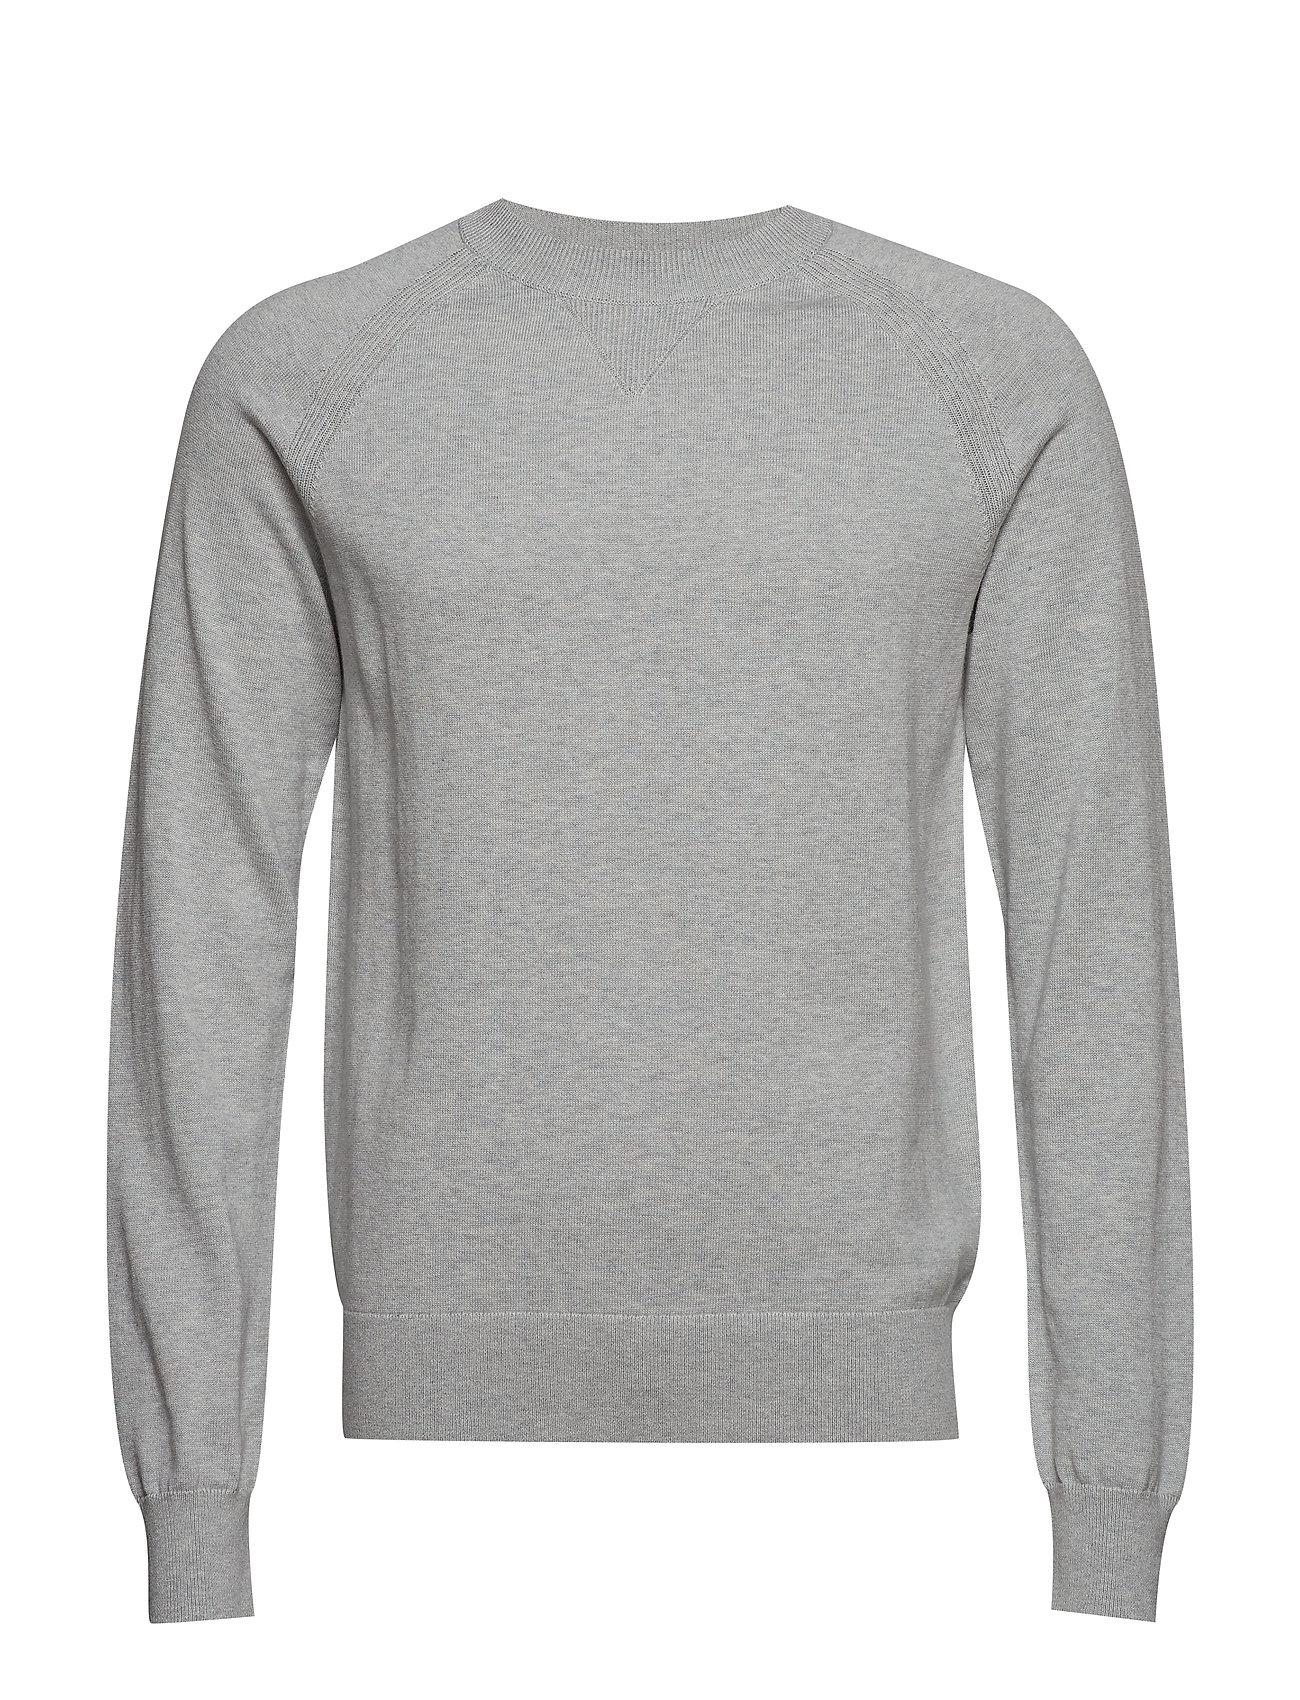 Filippa K M. Cotton Cashmere Knitted Swe - LIGHT GREY